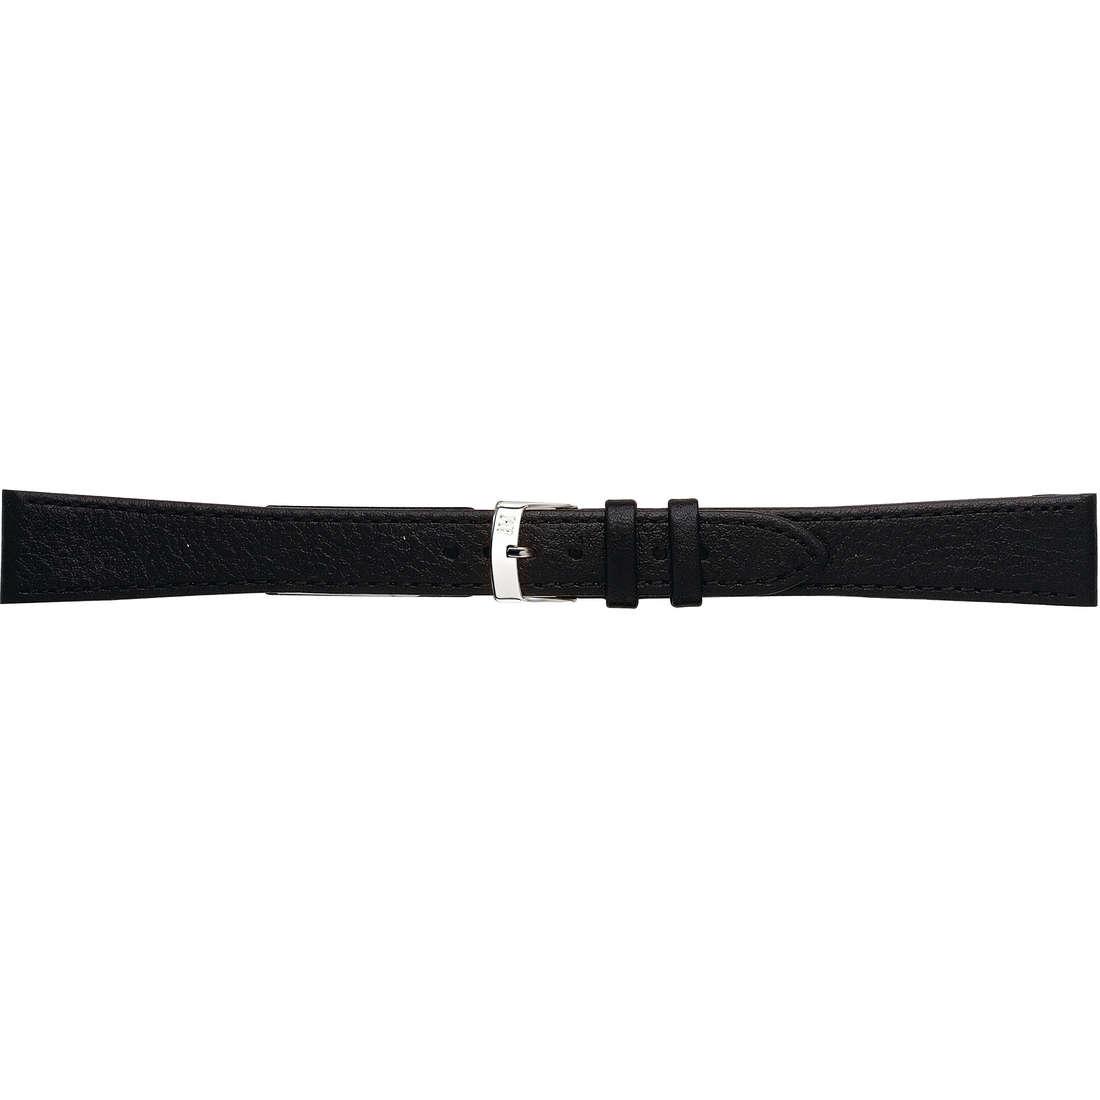 watch watch bands watch straps man Morellato I Lunghi A01K0753333019CR16